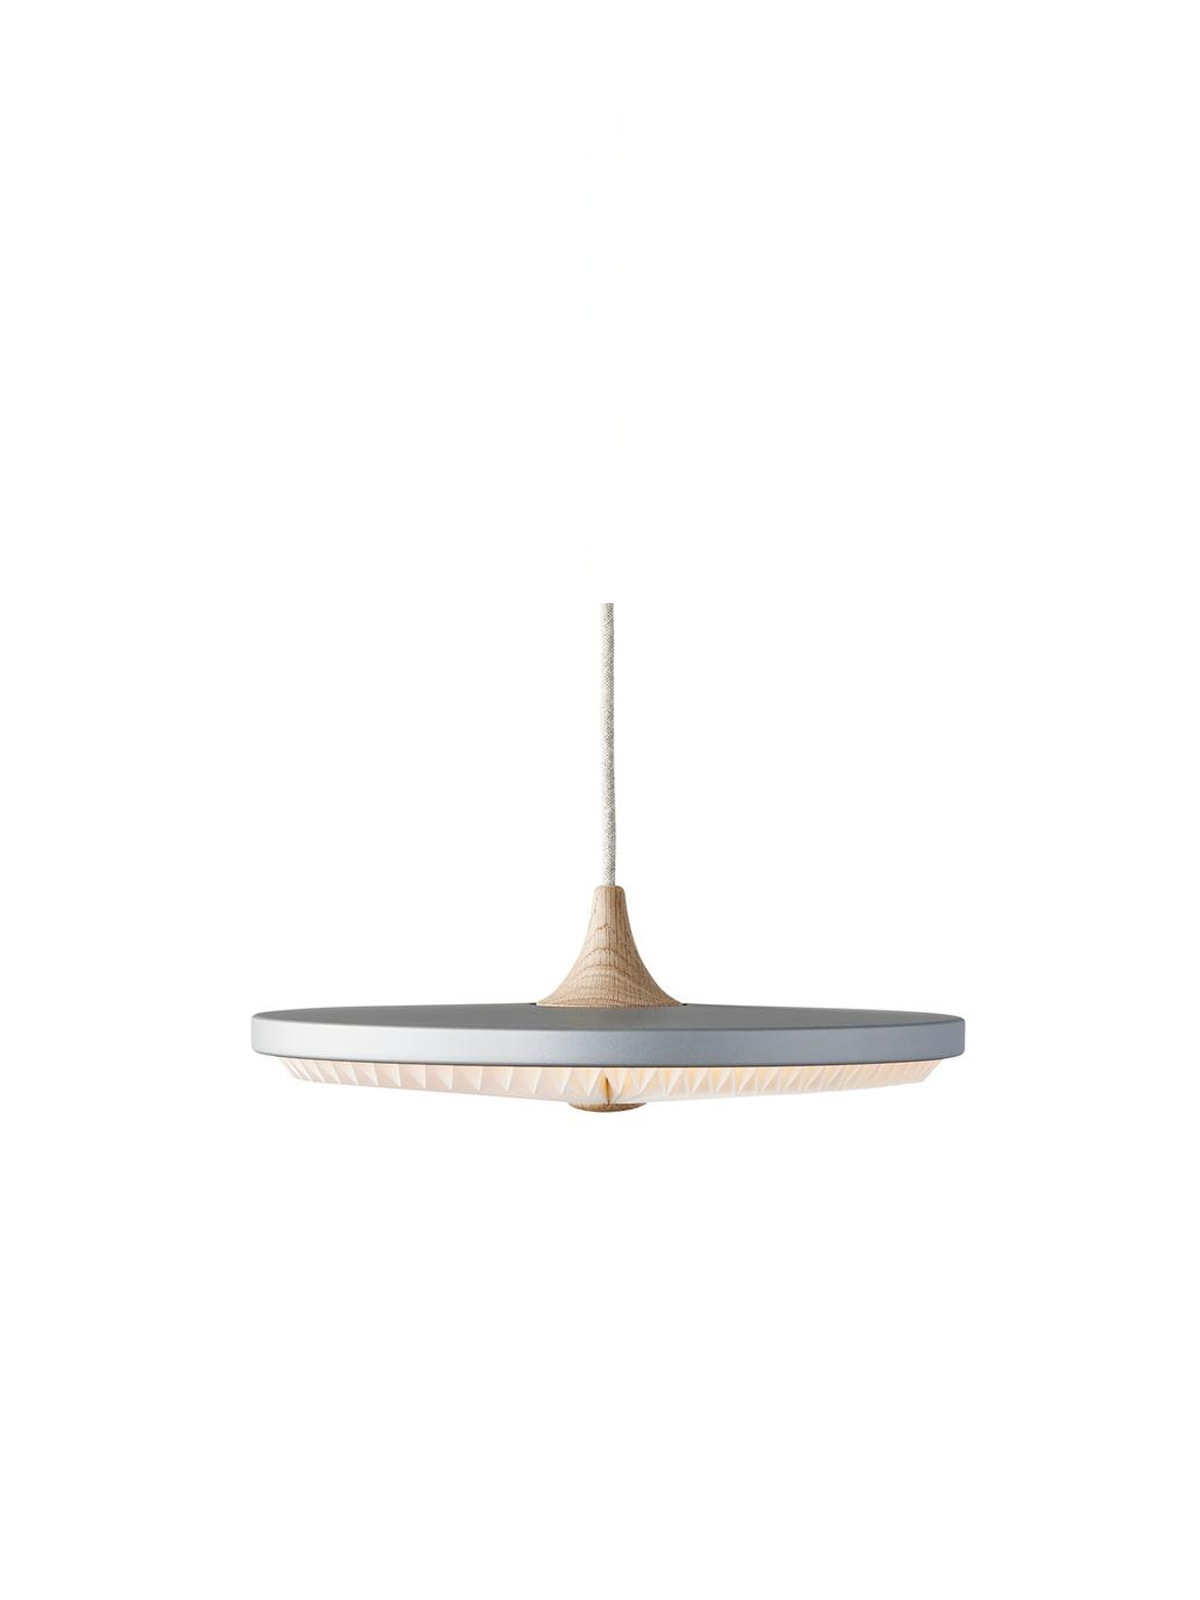 Soleil 198 Le Klint Pendelleuchte Silber Cloud DesignOrt Leuchten Berlin Onlineshop